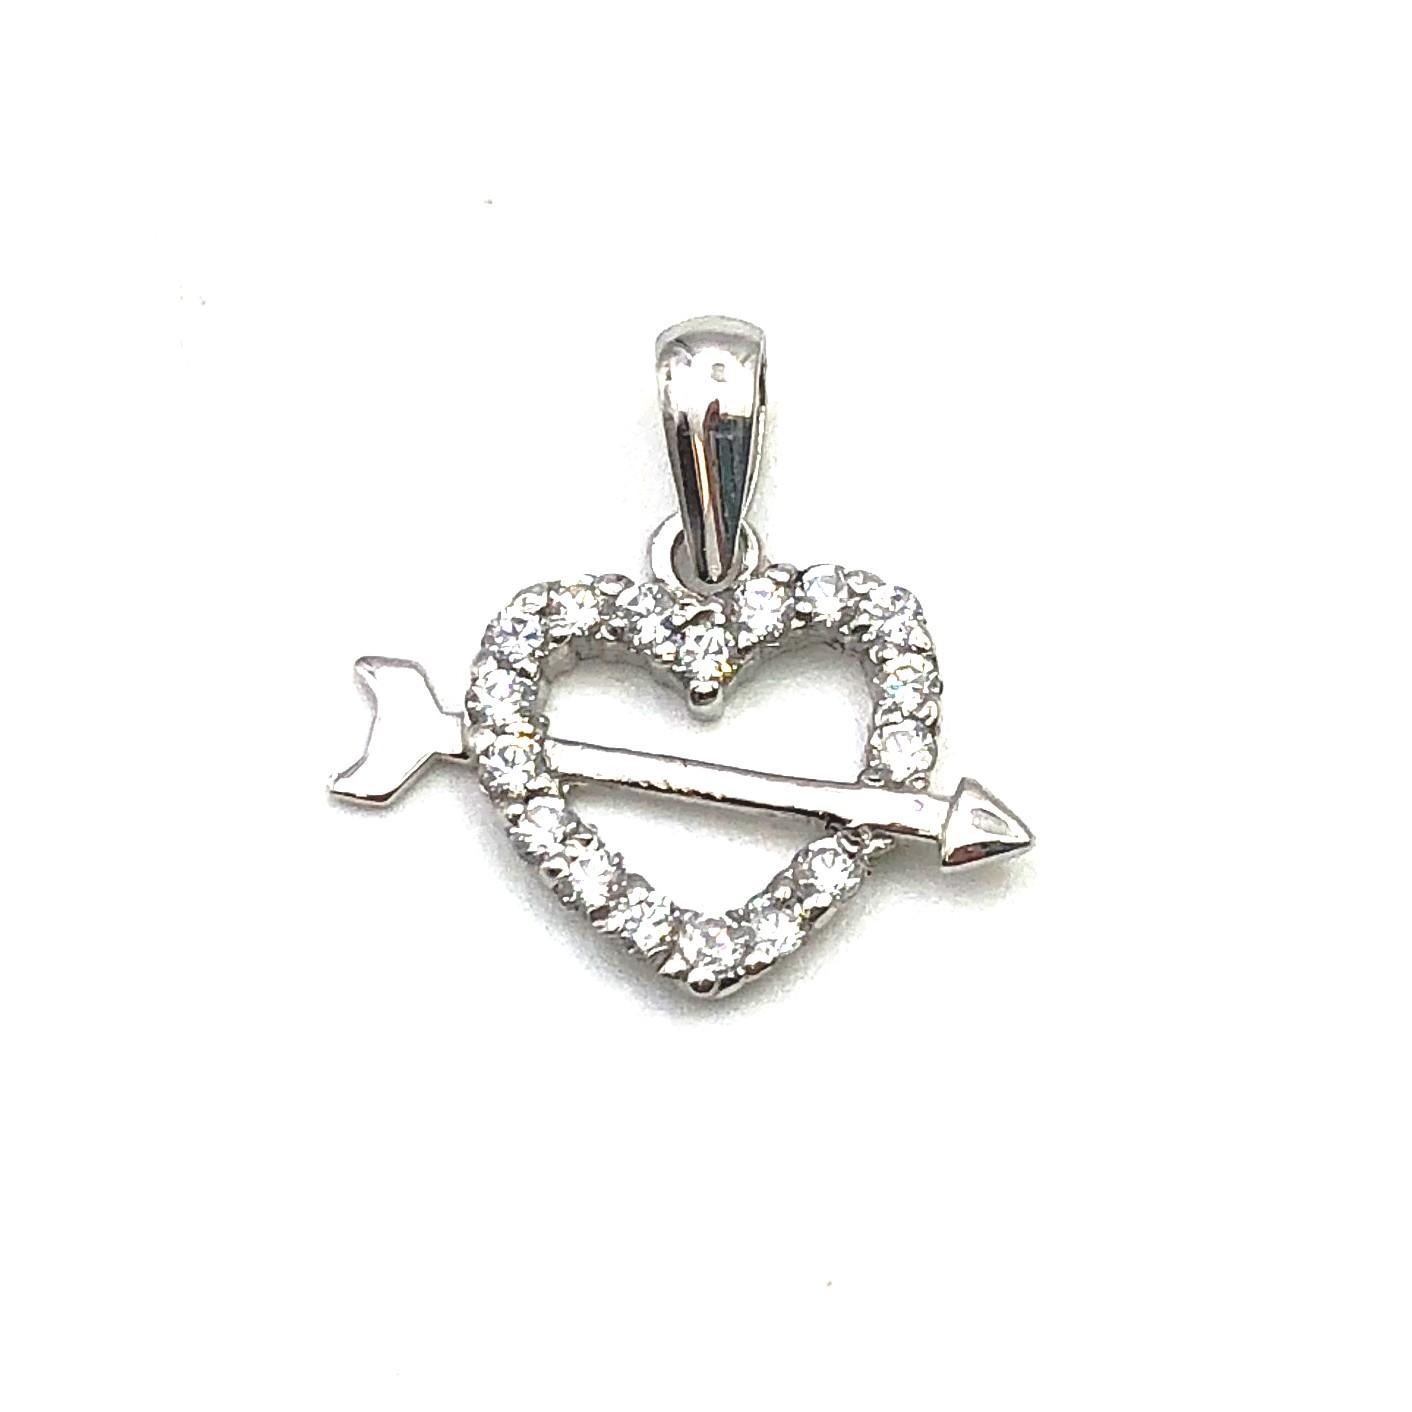 4d007db971ed colgante de oro blanco corazón love san valentín amor joyería juan luis  larráyoz pamplona